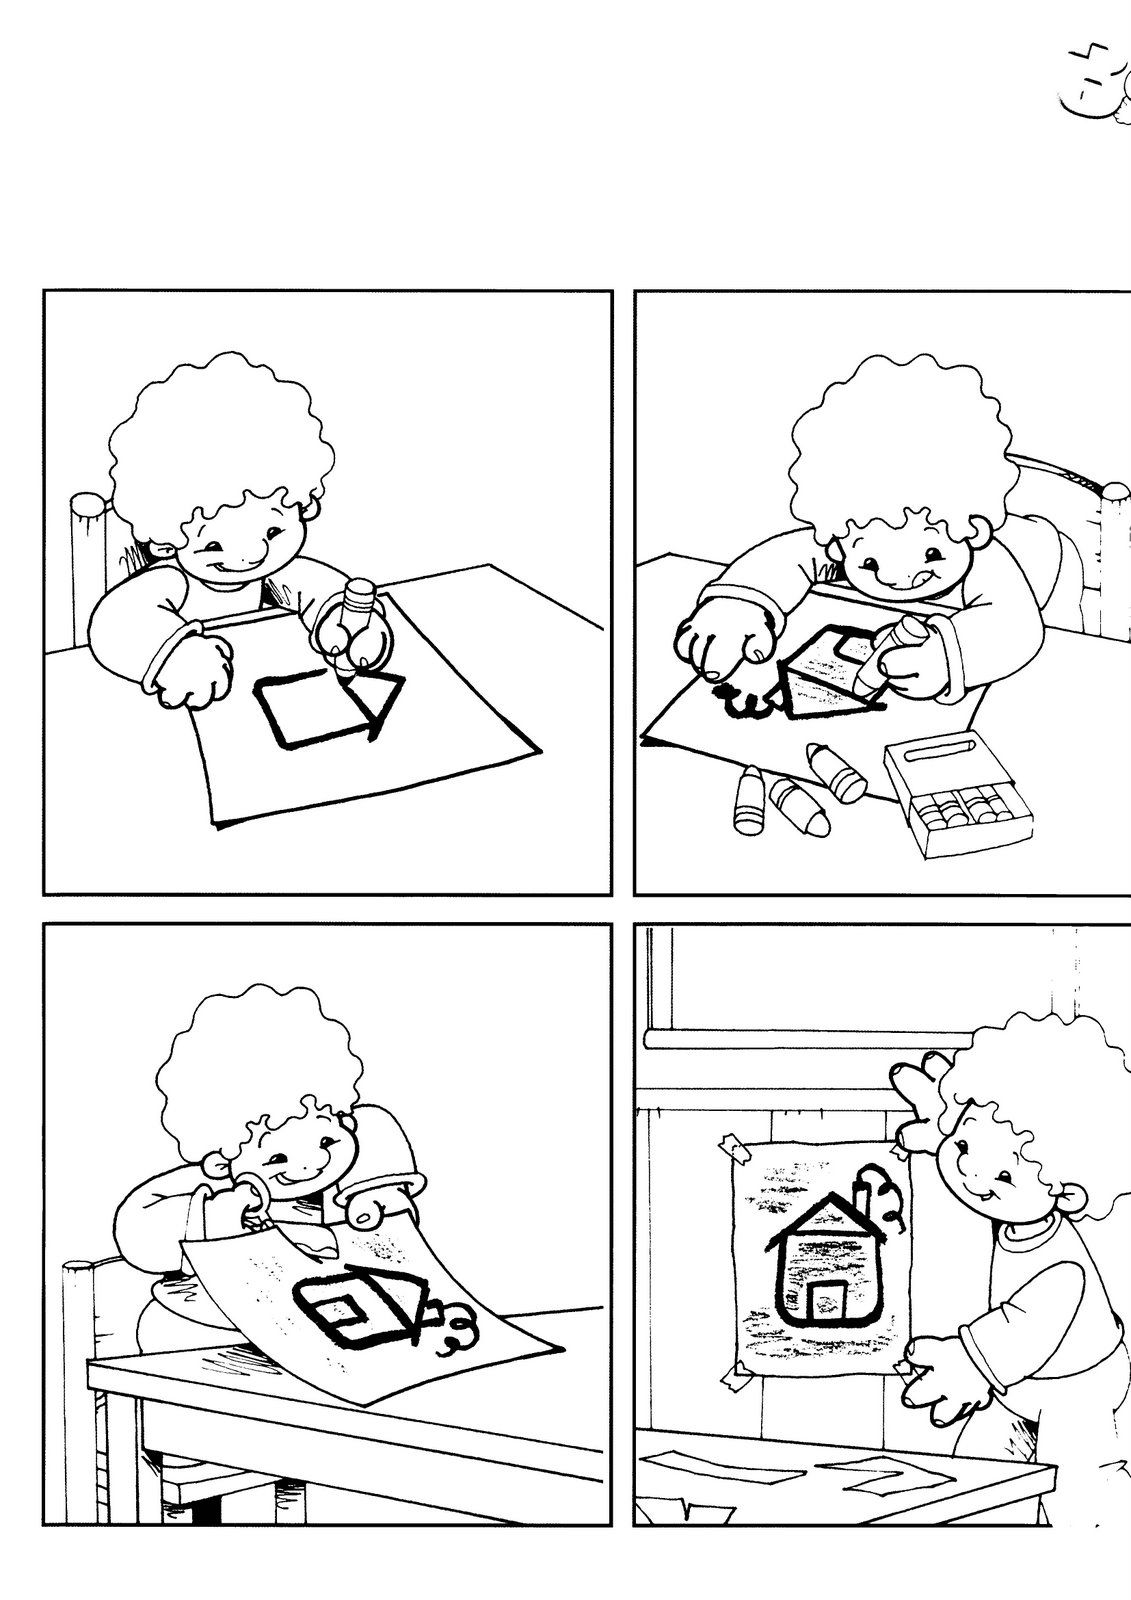 Foto: dibujo | alfabetização | Pinterest | Bildgeschichten ...